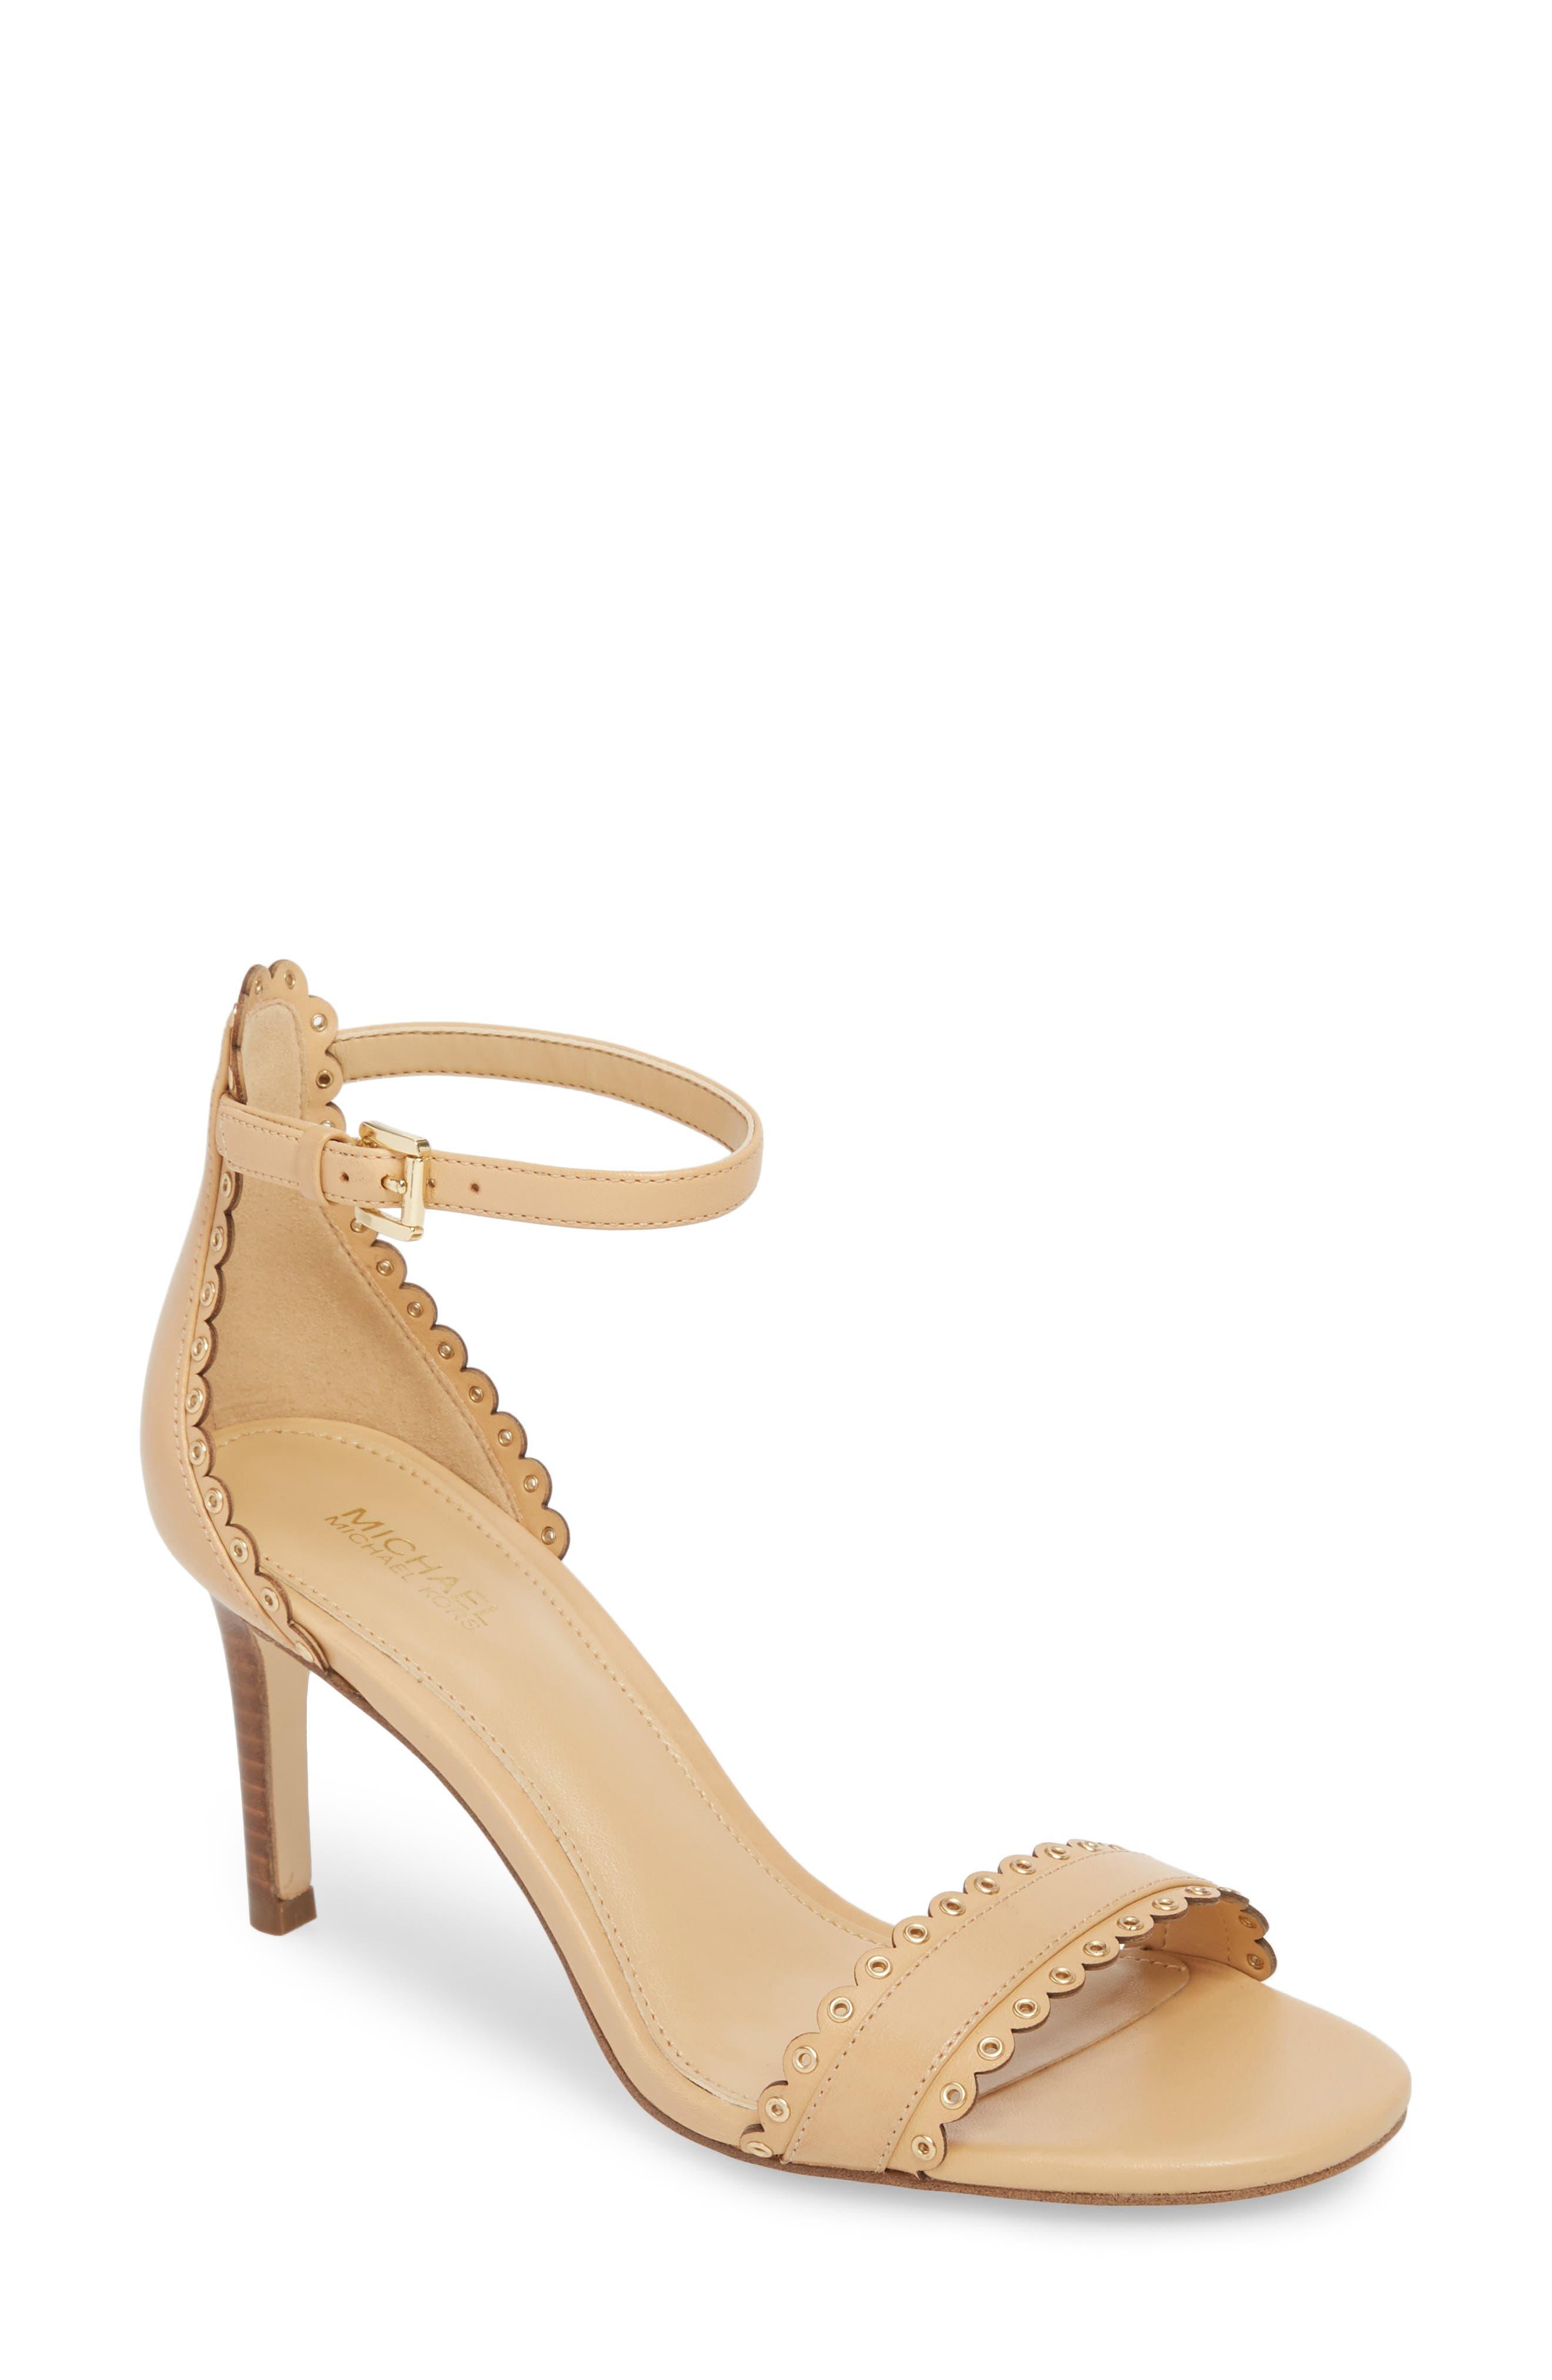 Jessie Sandal,                         Main,                         color, Butternut Leather